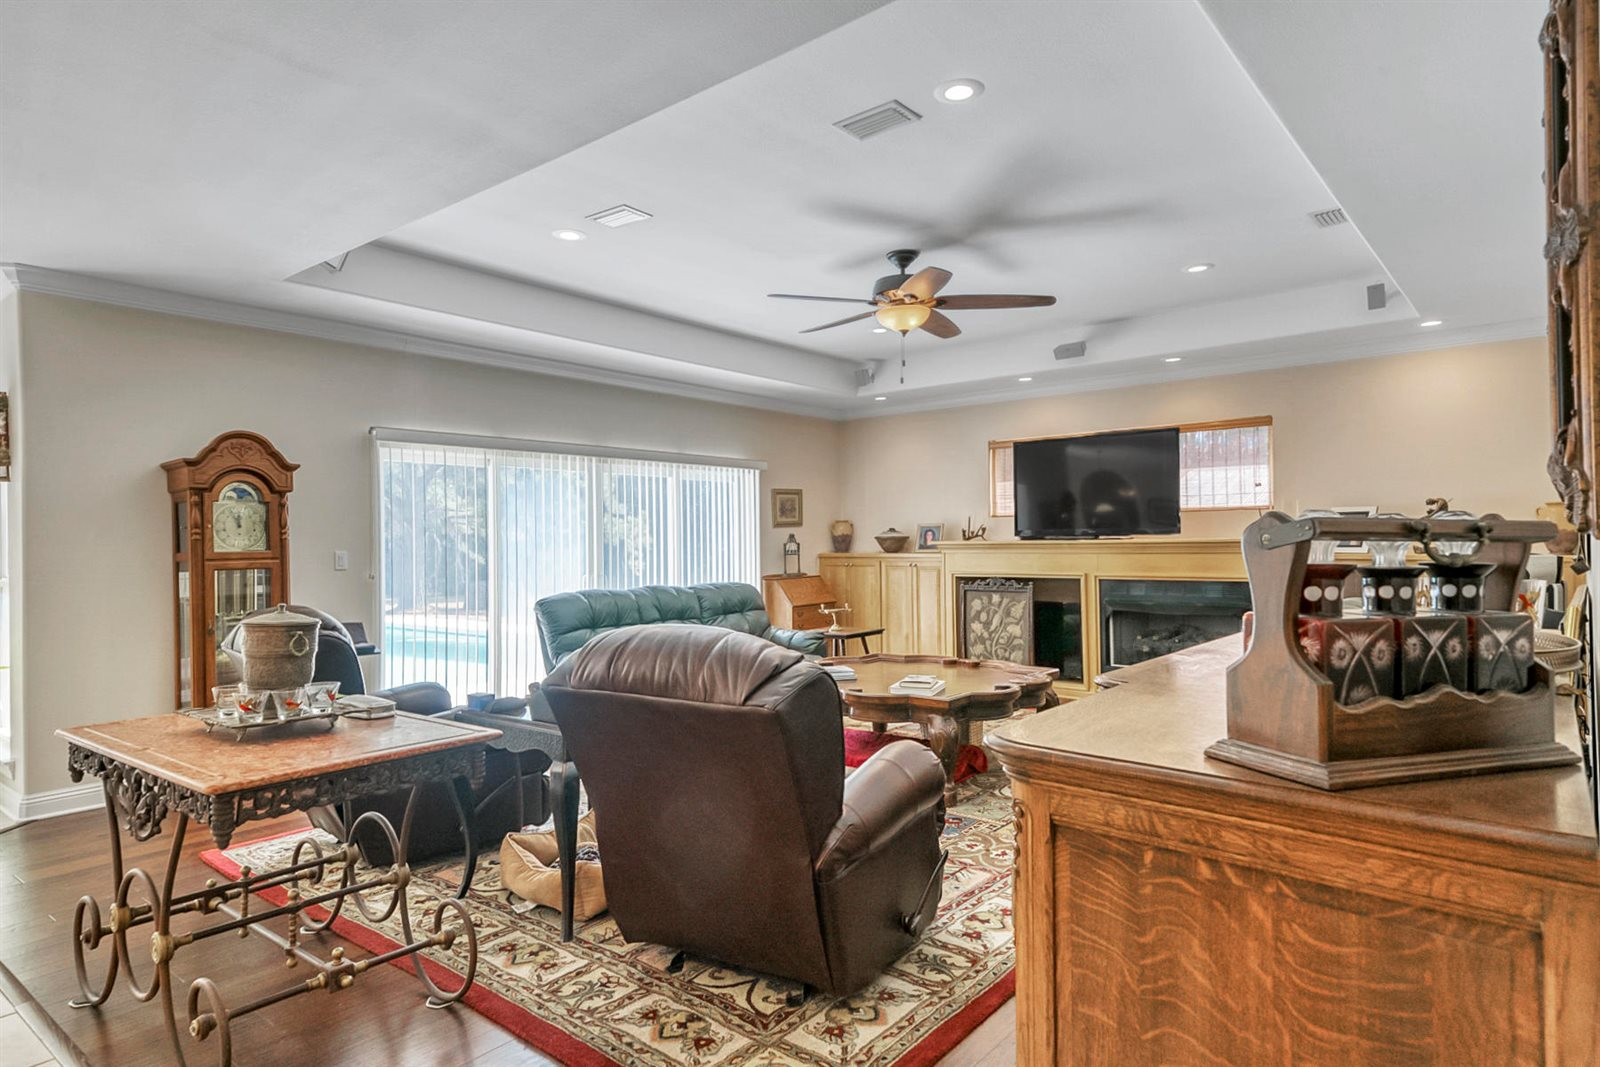 4196 East State Highway 20, Freeport, FL 32439